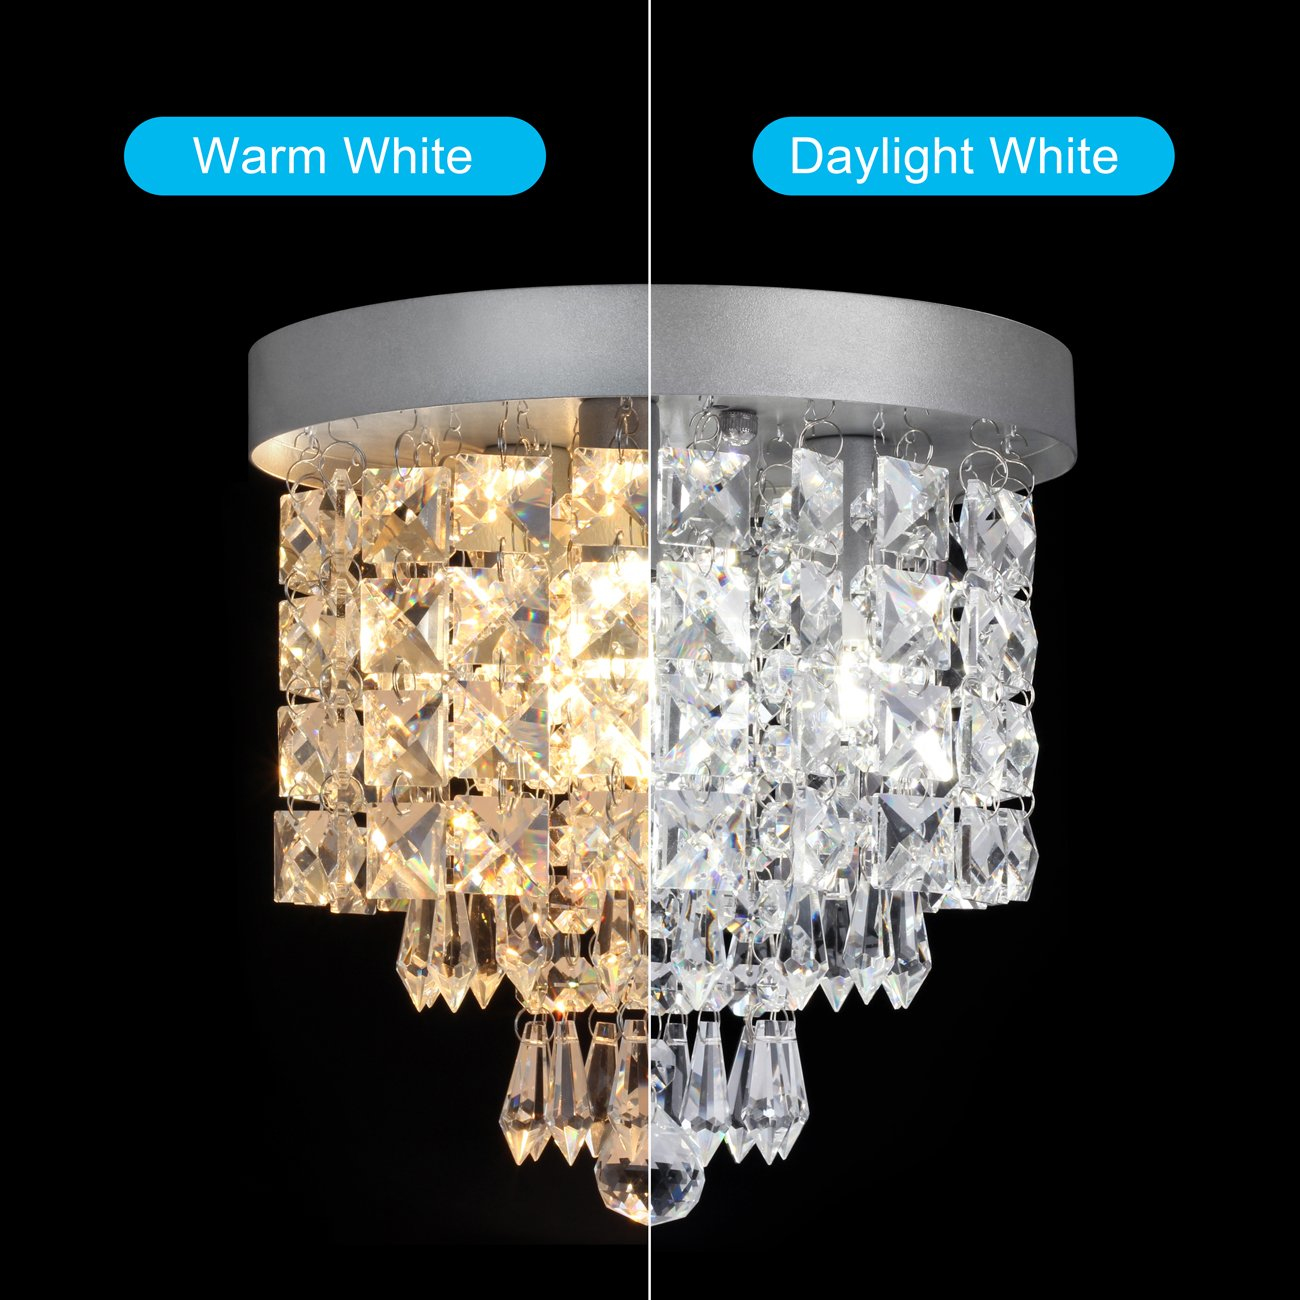 SHINE HAI Crystal Chandelier, 3-light Modern Flush Mount Ceiling Pendant Light H9.45'' X W8.66'' for Bedroom, Living Room, Dining Room, Kitchen, Hallway by SHINE HAI (Image #3)